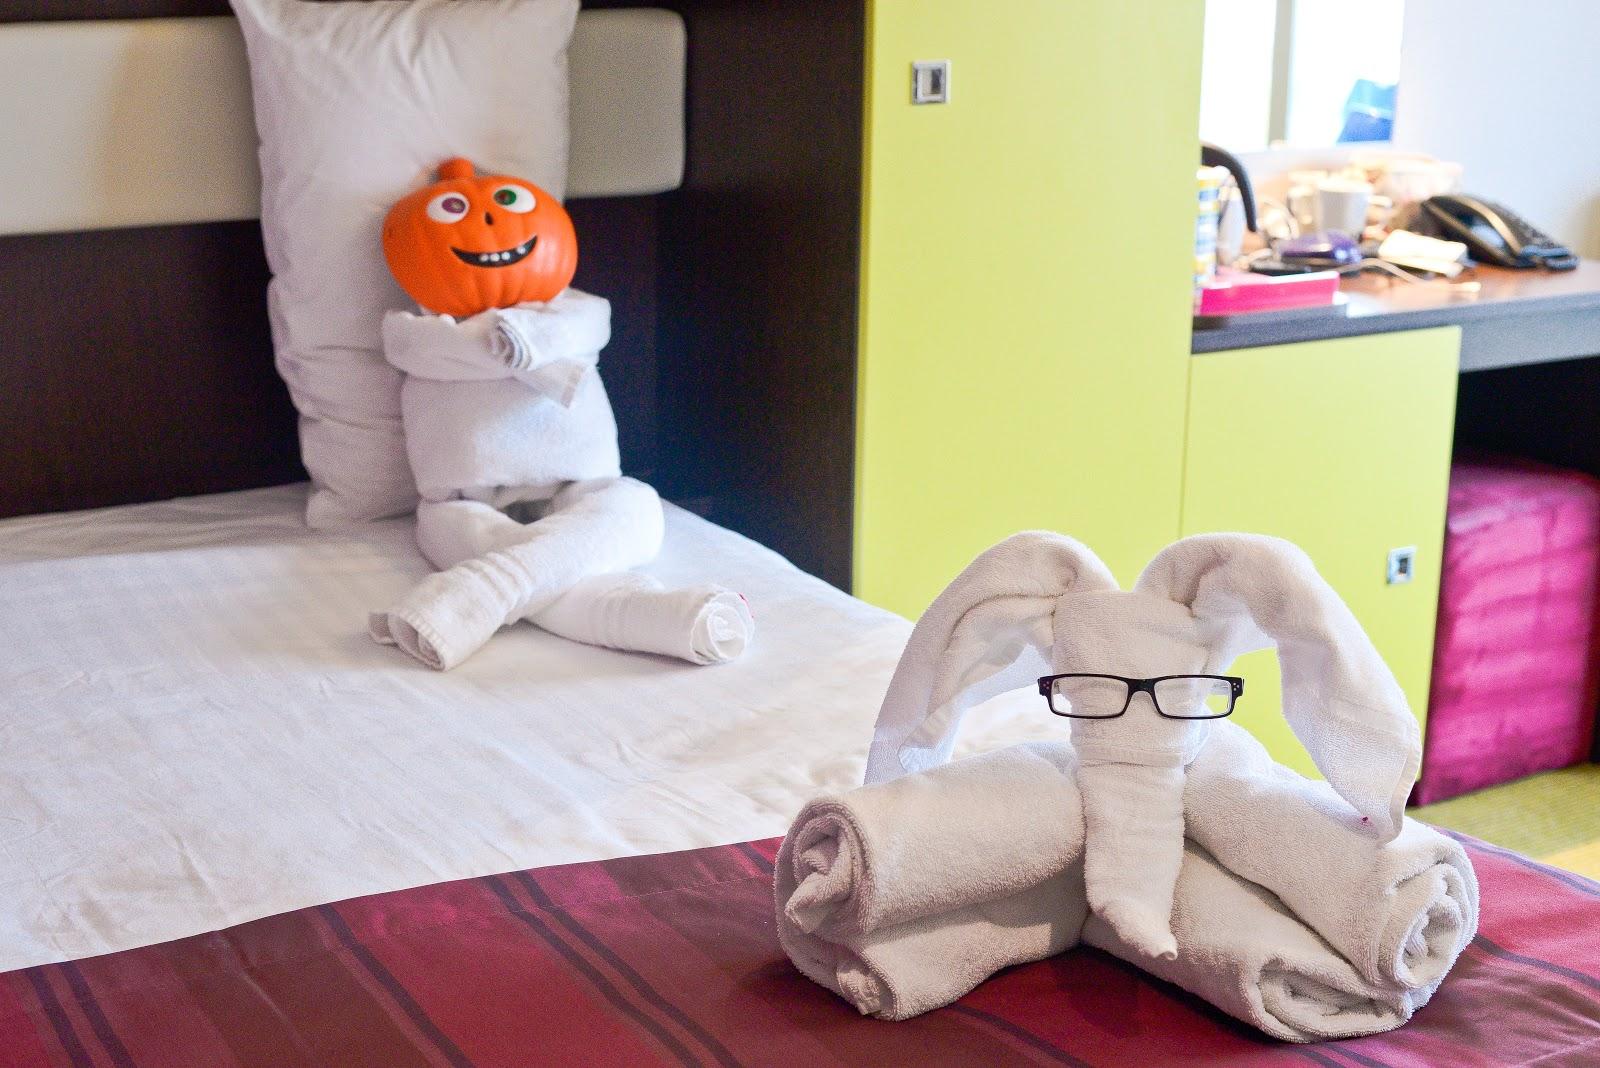 halloween towel art, Butlins bognor regis just for tots review, butlins, butlins bognor regis, just for tots, uk holiday for kids under 5,